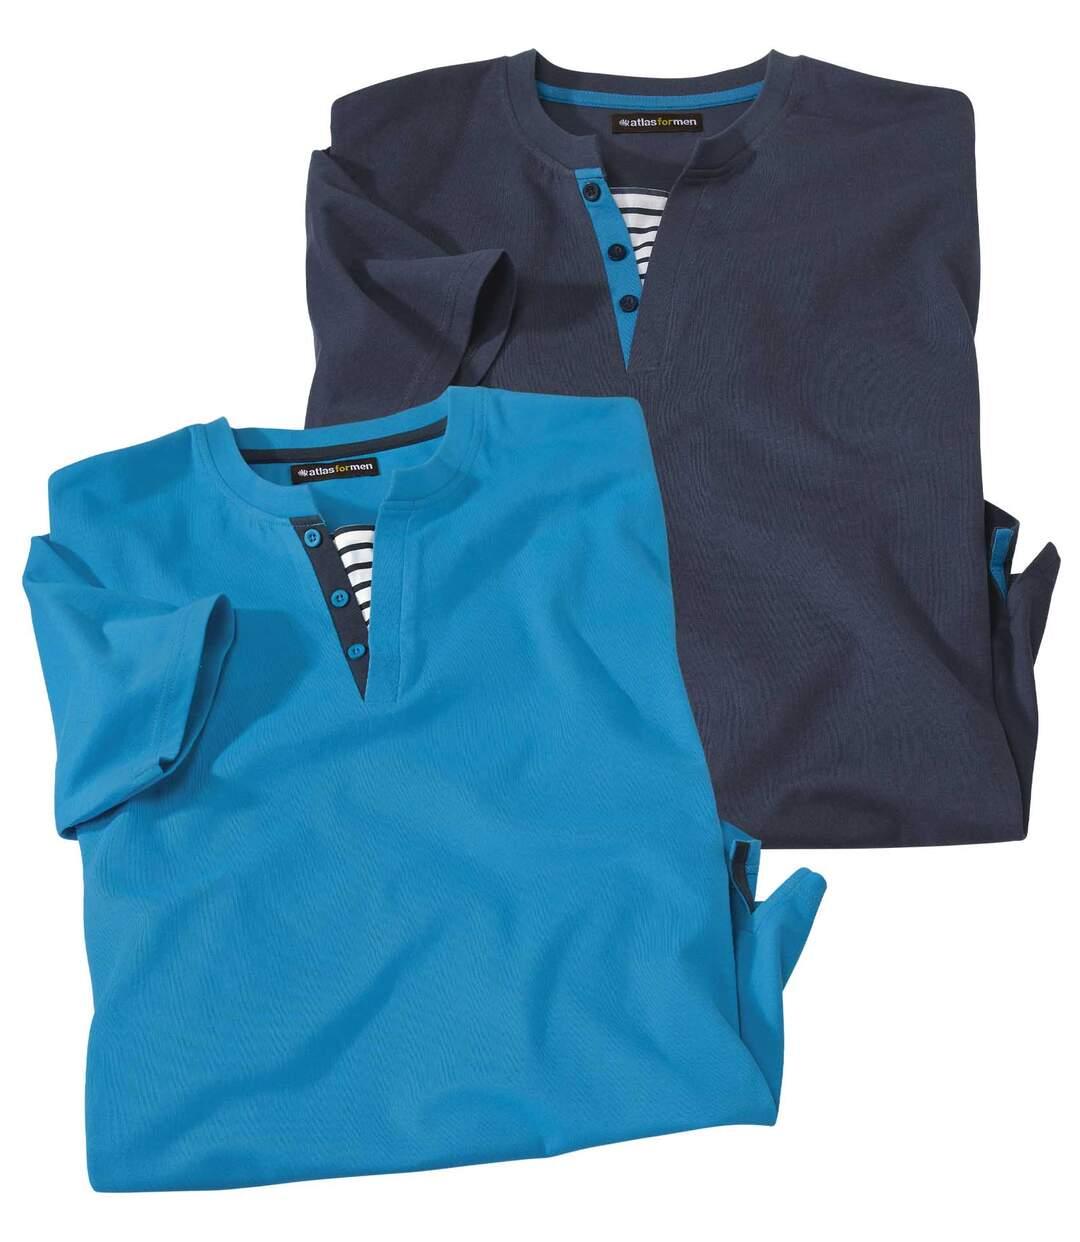 Set van 2 T-shirts Sailing